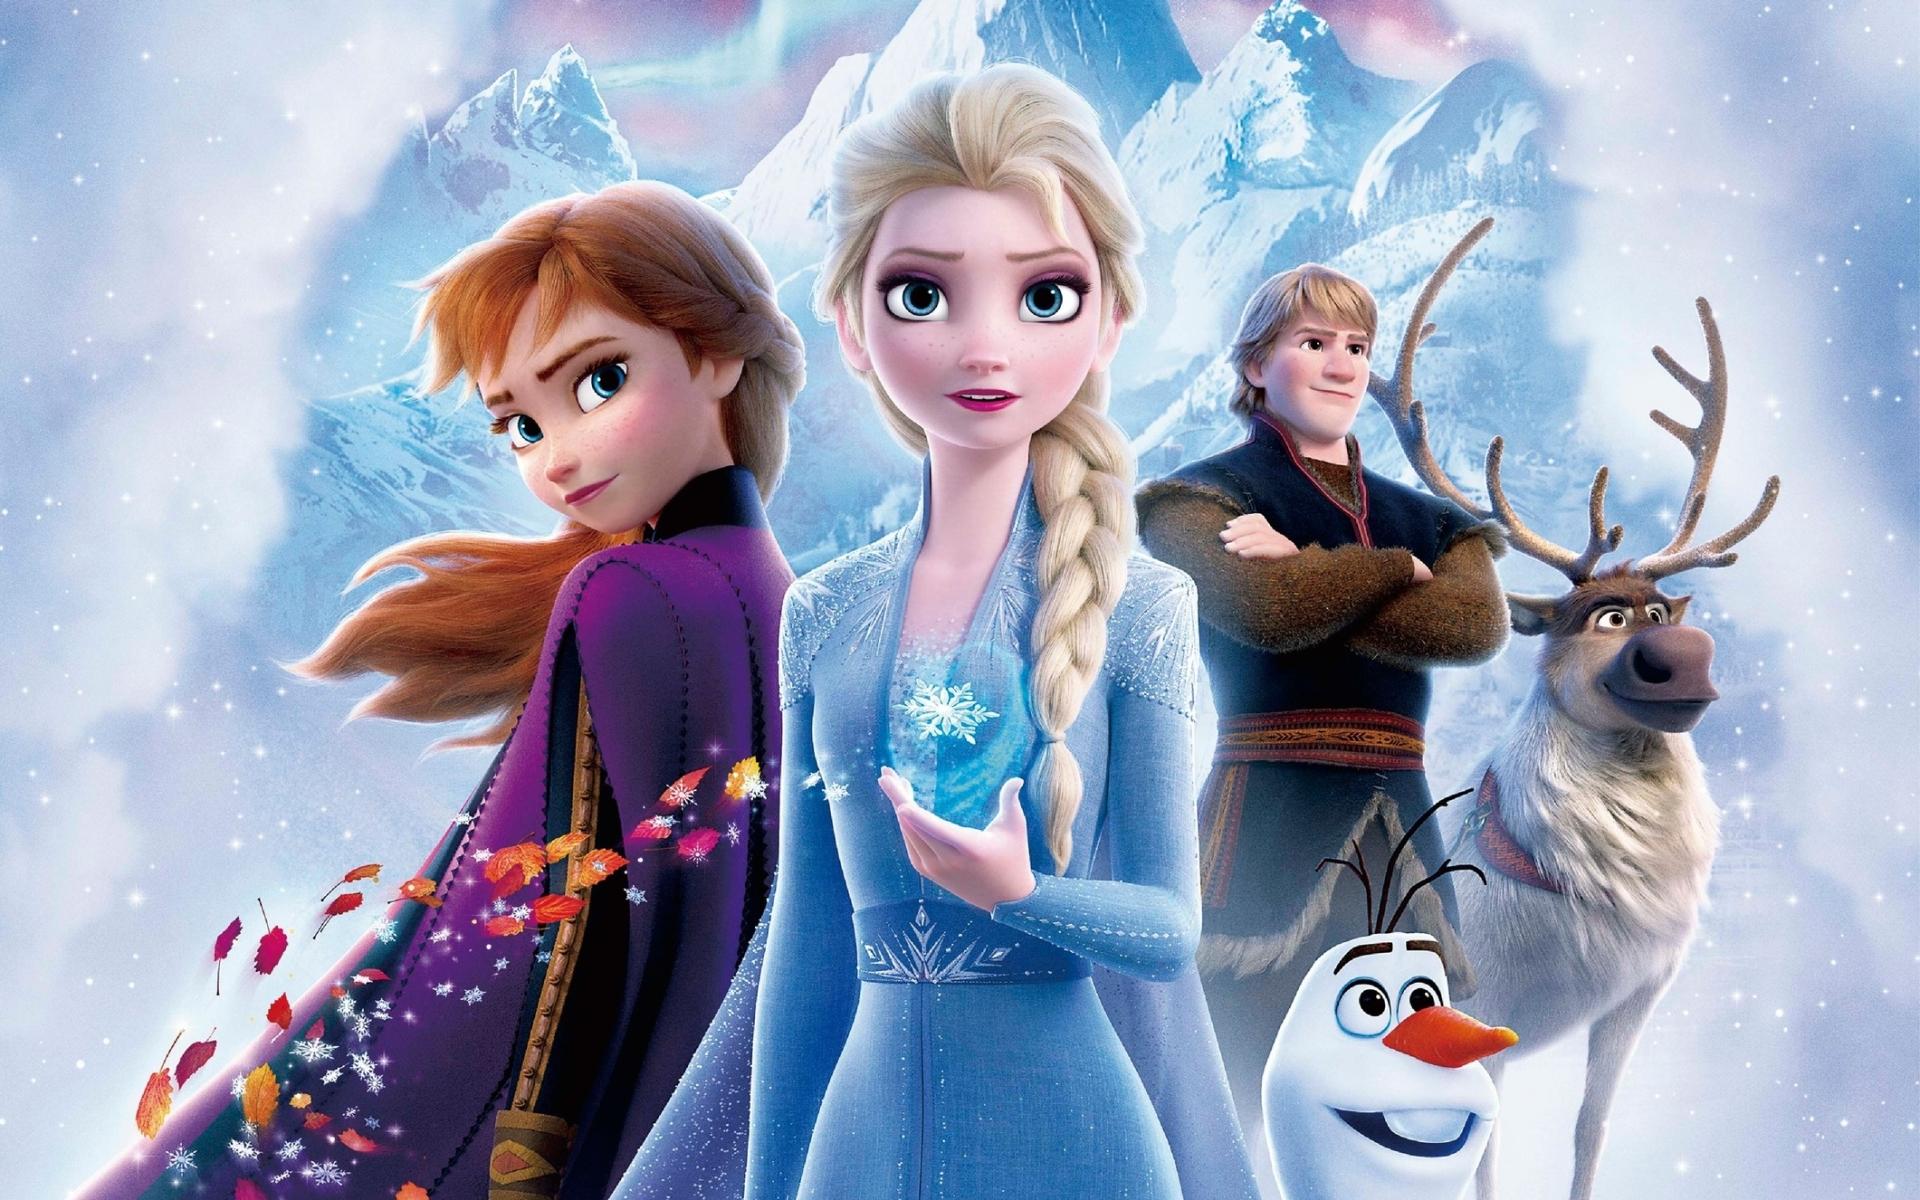 La Reine Des Neiges 2 Fond D Ecran Elsa The Snow Queen Fond D Ecran 43115968 Fanpop